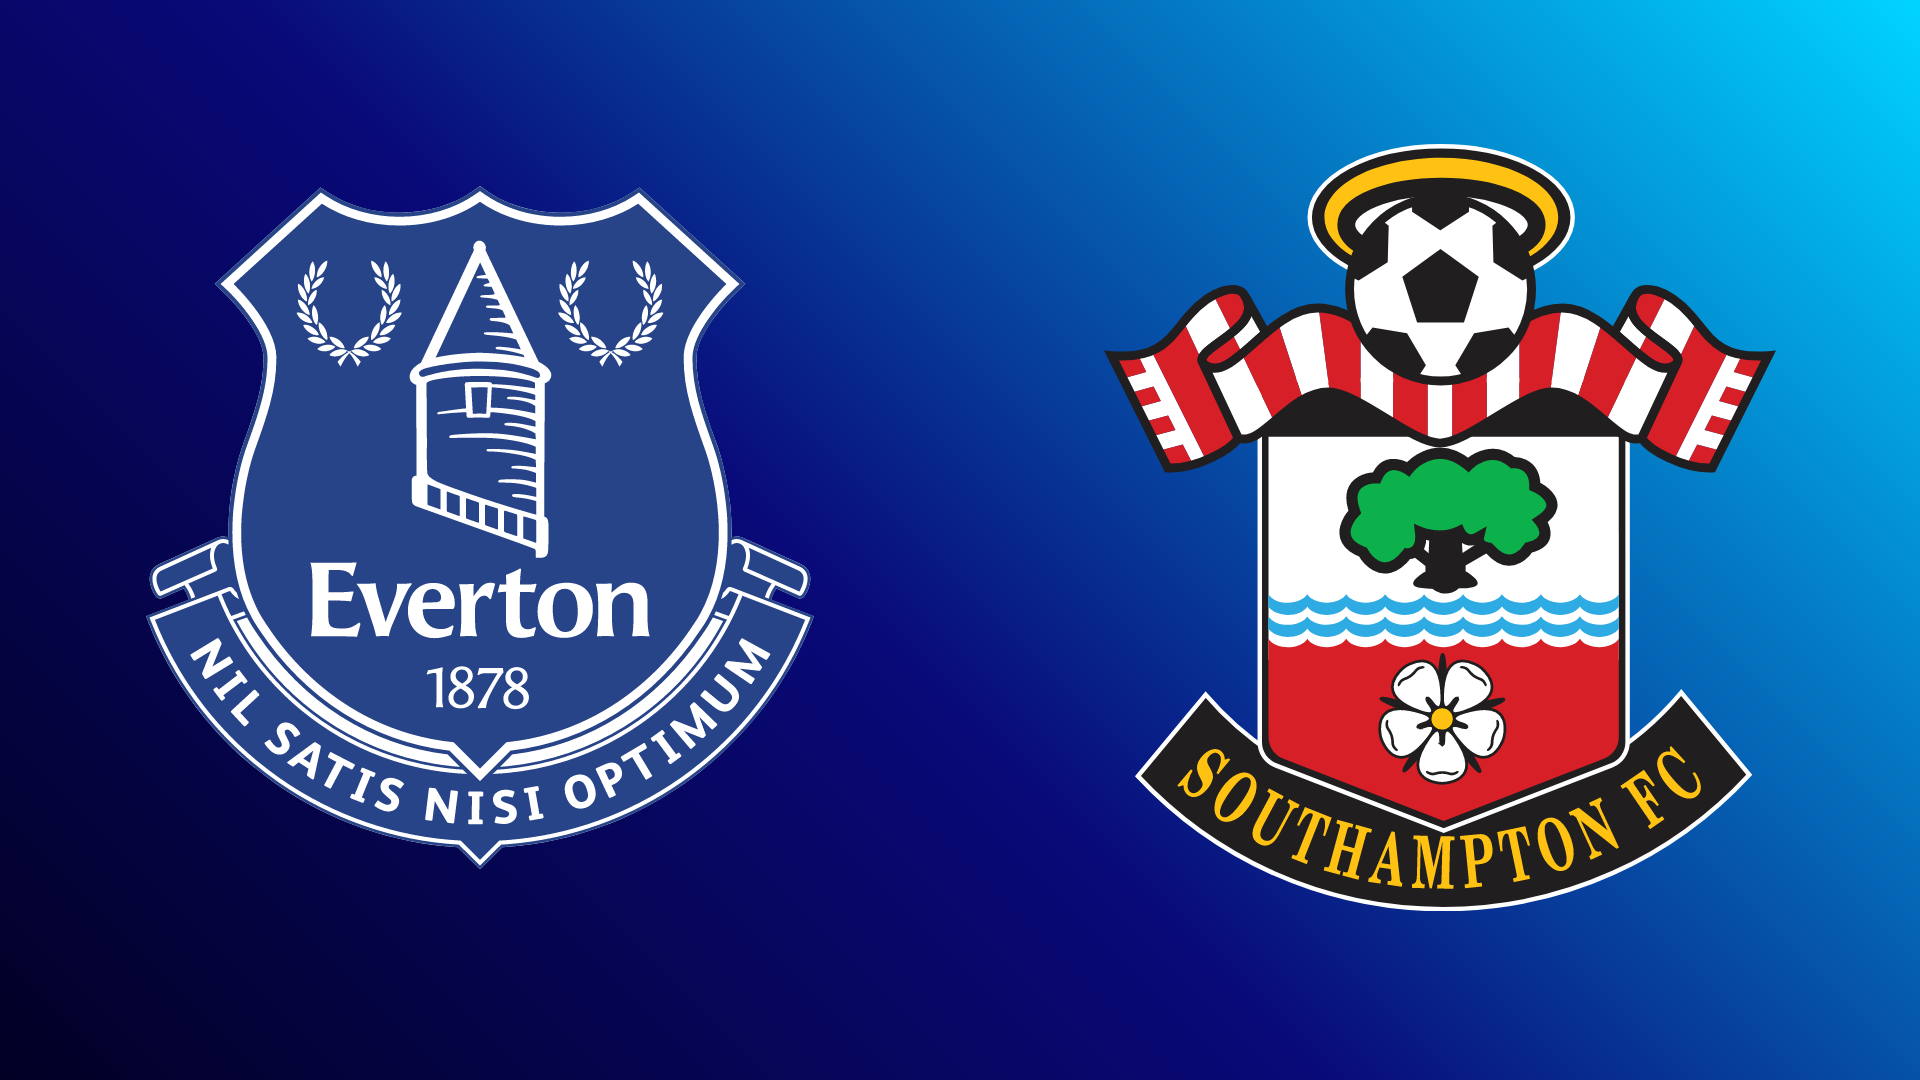 Live PL: FC Everton - FC Southampton, 26. Spieltag 01.03.2021 um 20:50 Uhr auf Sky Ticket